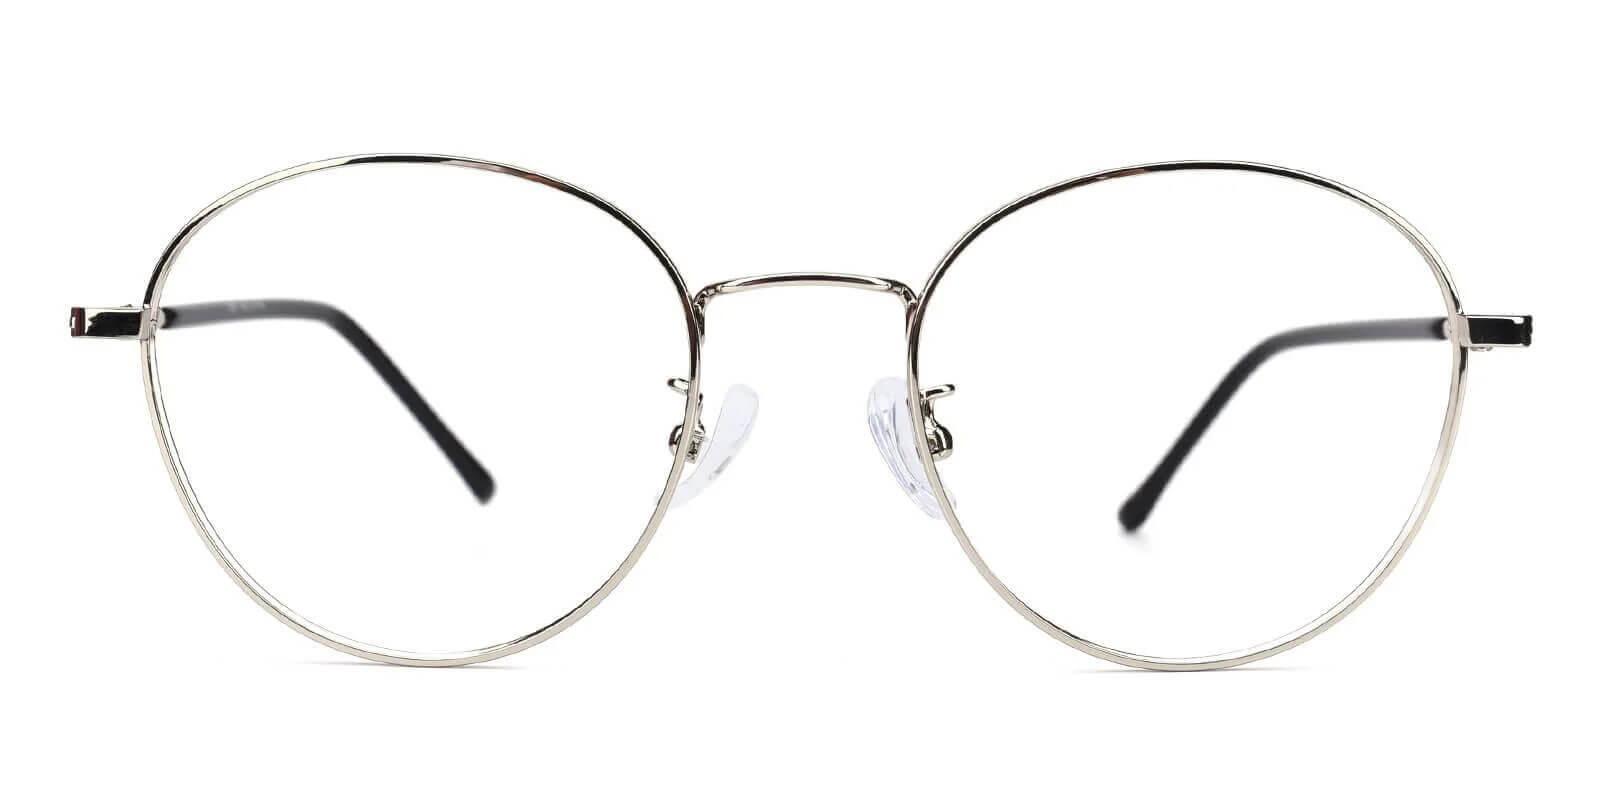 Joe Silver Metal Eyeglasses , NosePads Frames from ABBE Glasses